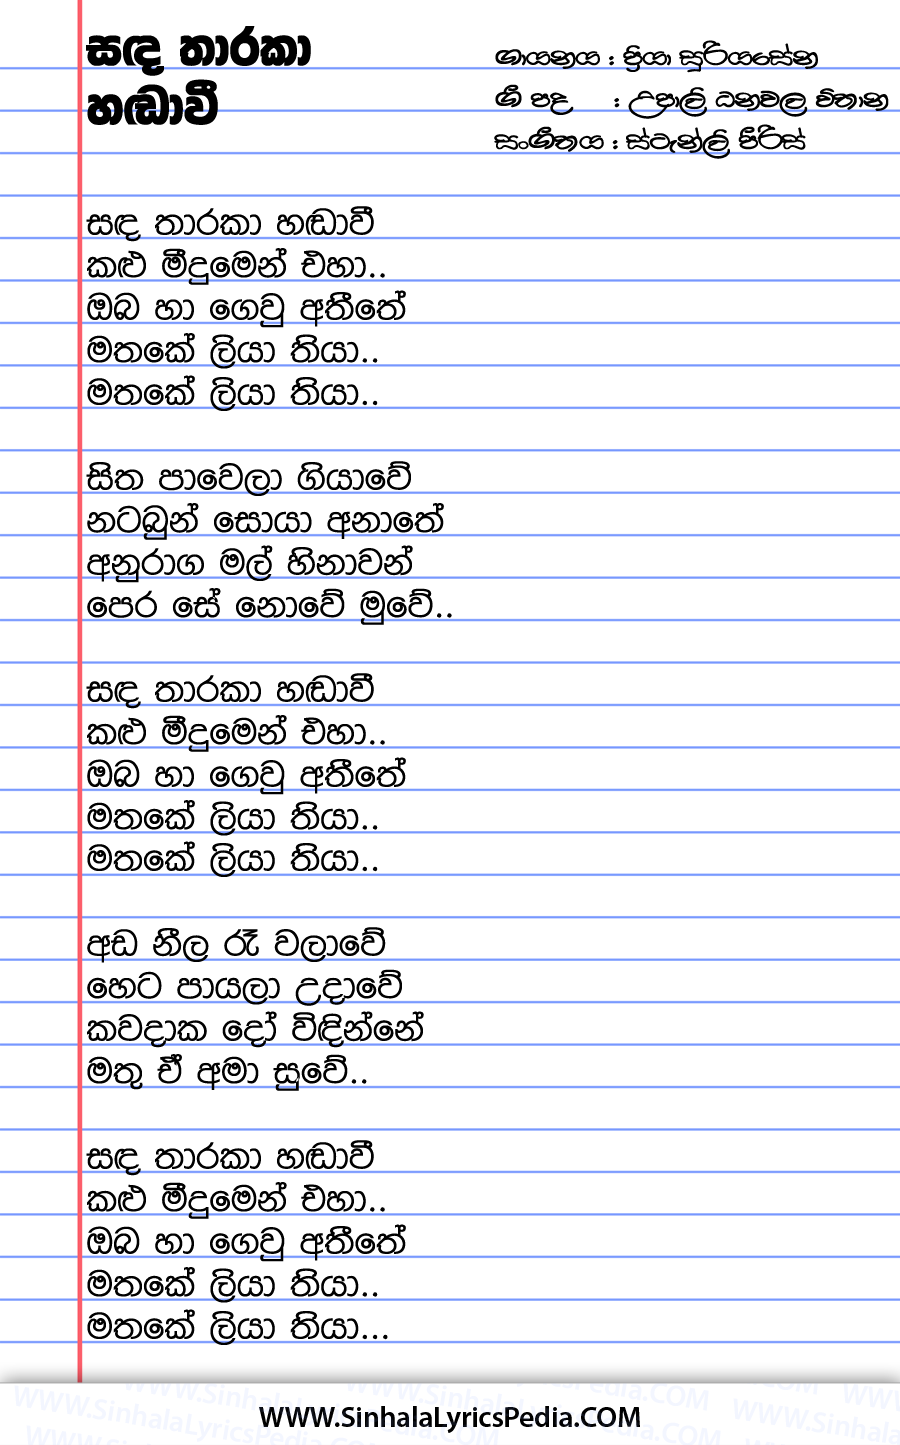 Sanda Tharaka Handawi Song Lyrics